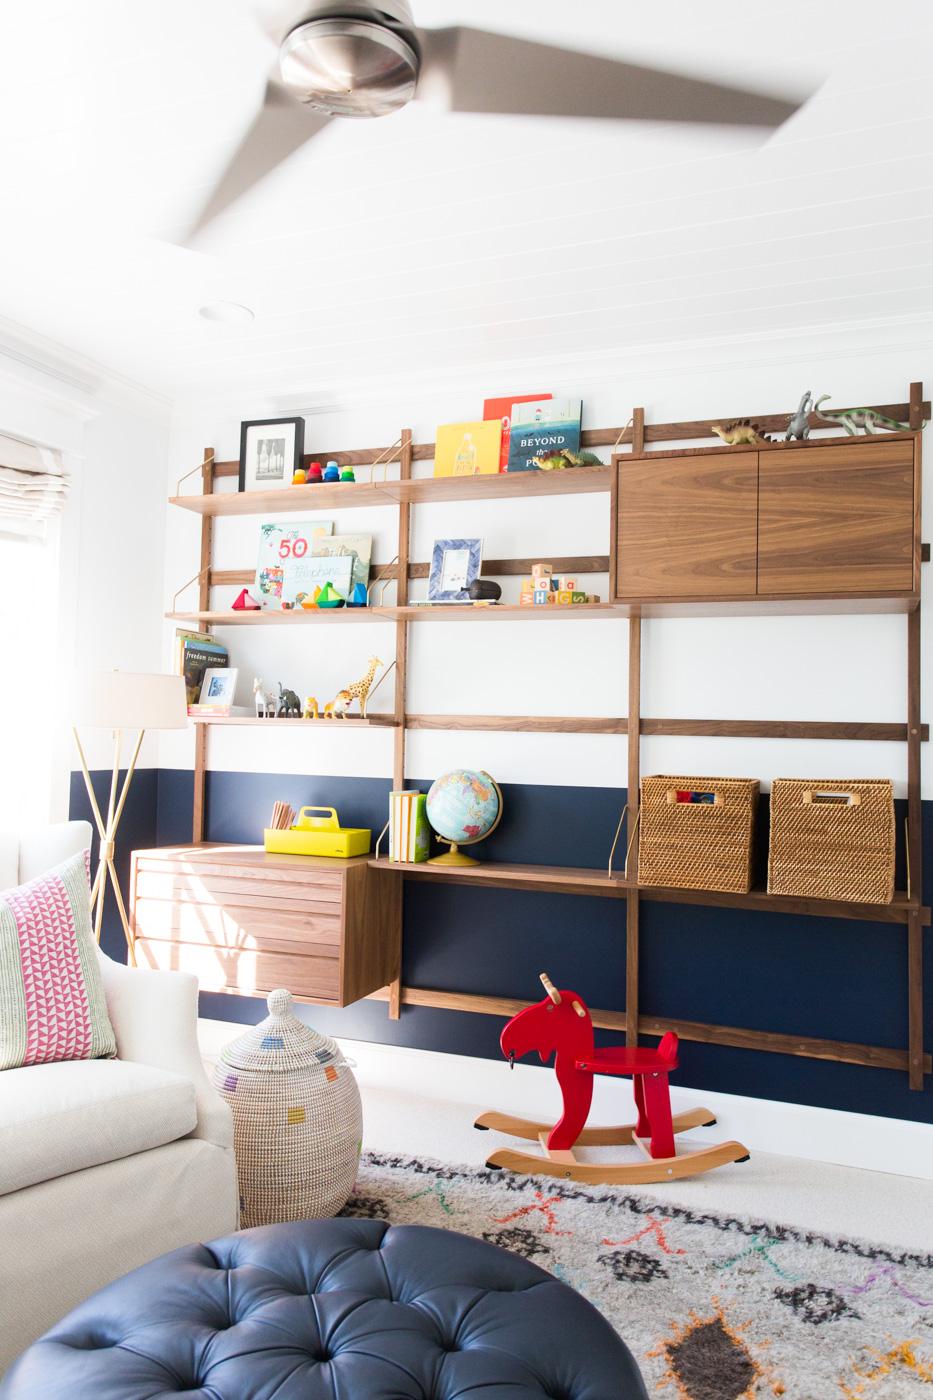 Navy+blue+half+wall+and+walnut+built-ins+||+Studio+McGee.jpg